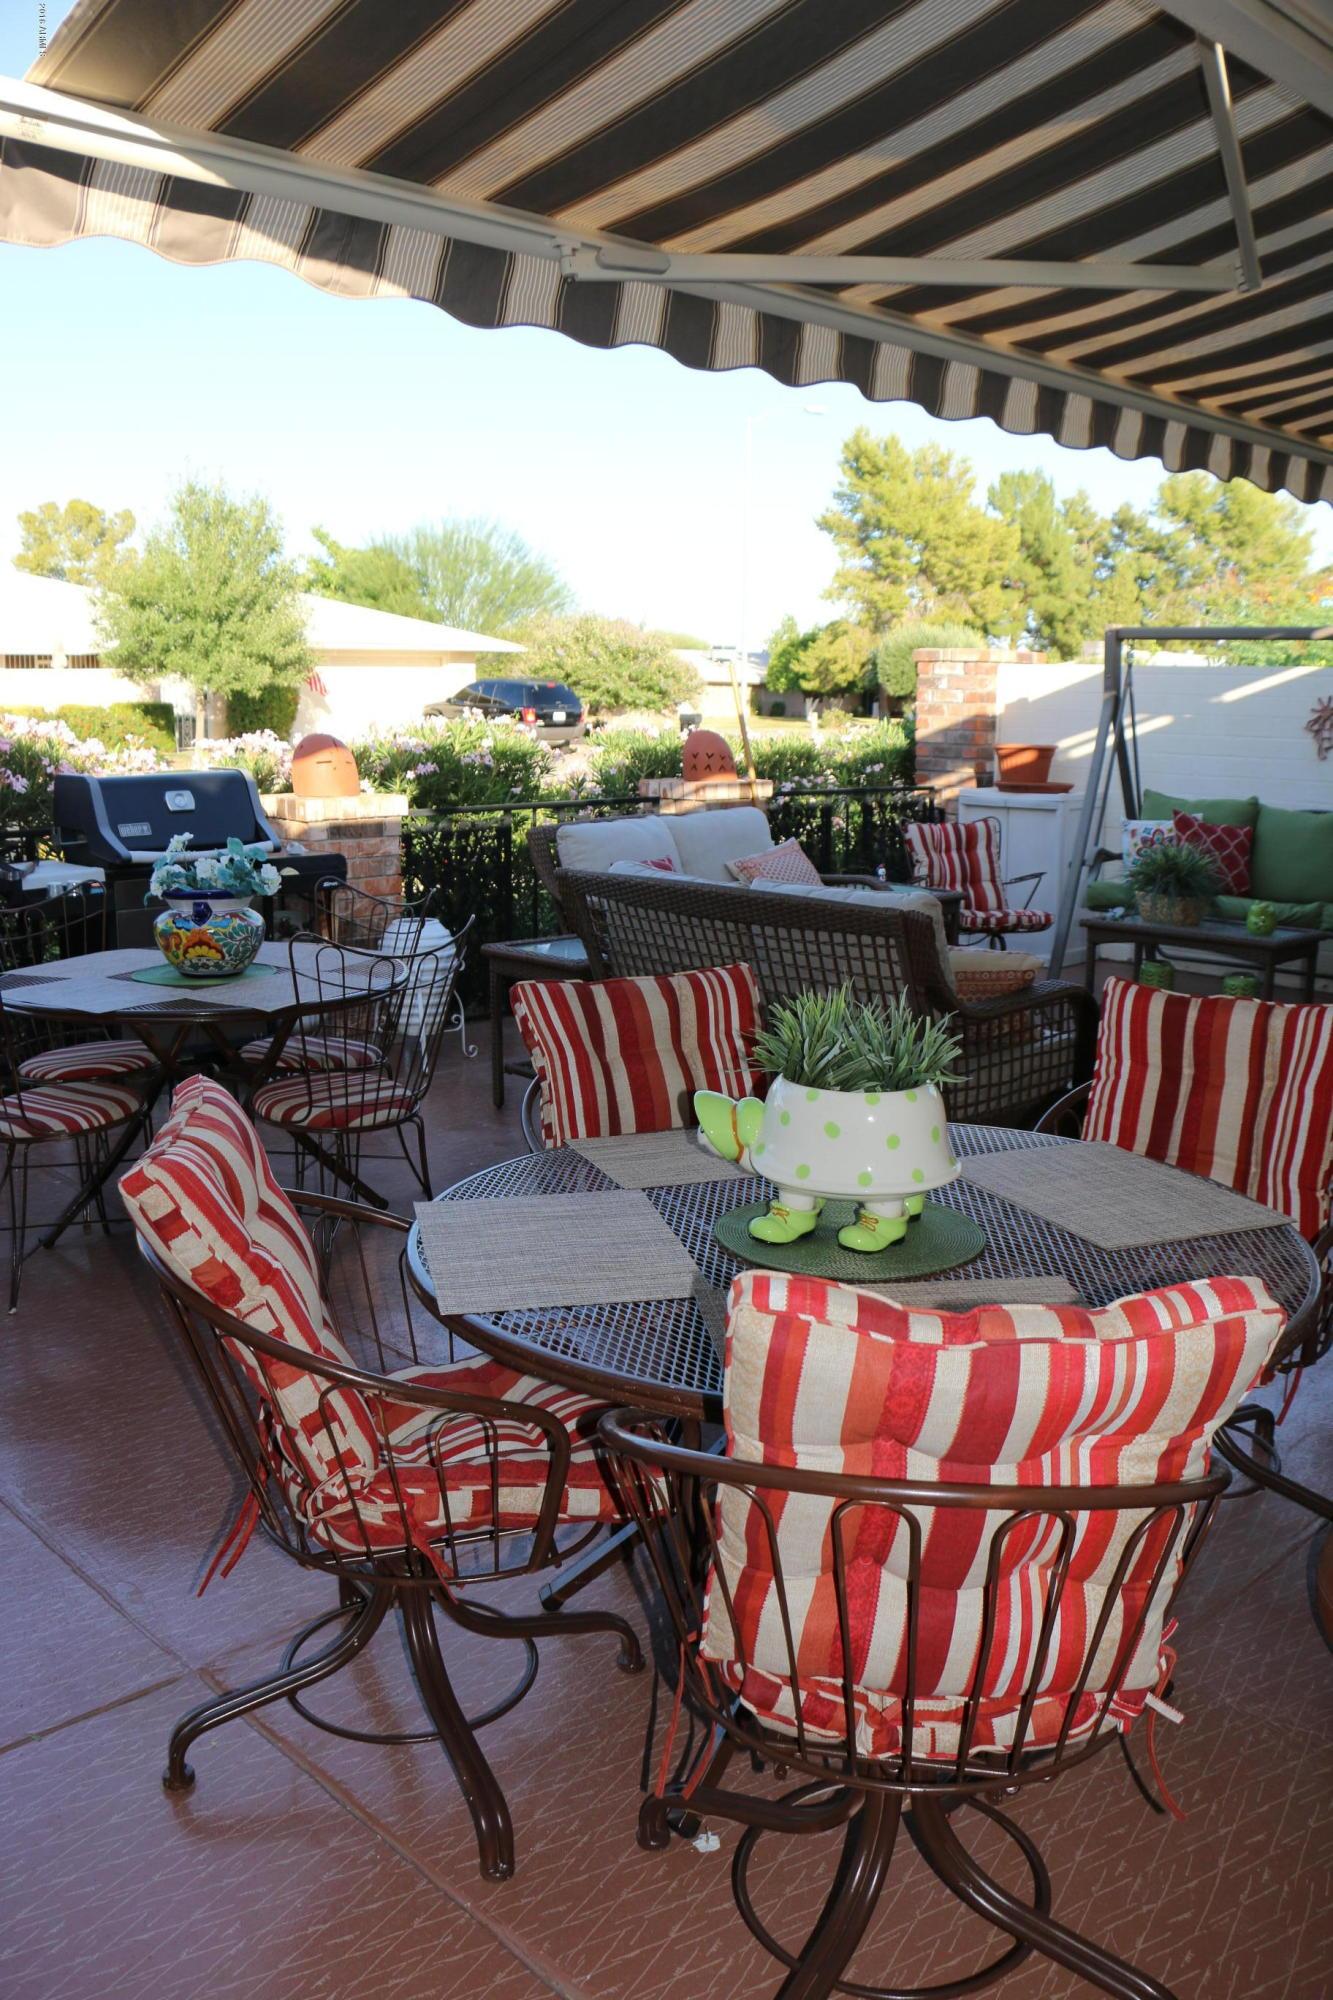 MLS 5869350 12807 W COPPERSTONE Drive, Sun City West, AZ 85375 Sun City West AZ Condo or Townhome